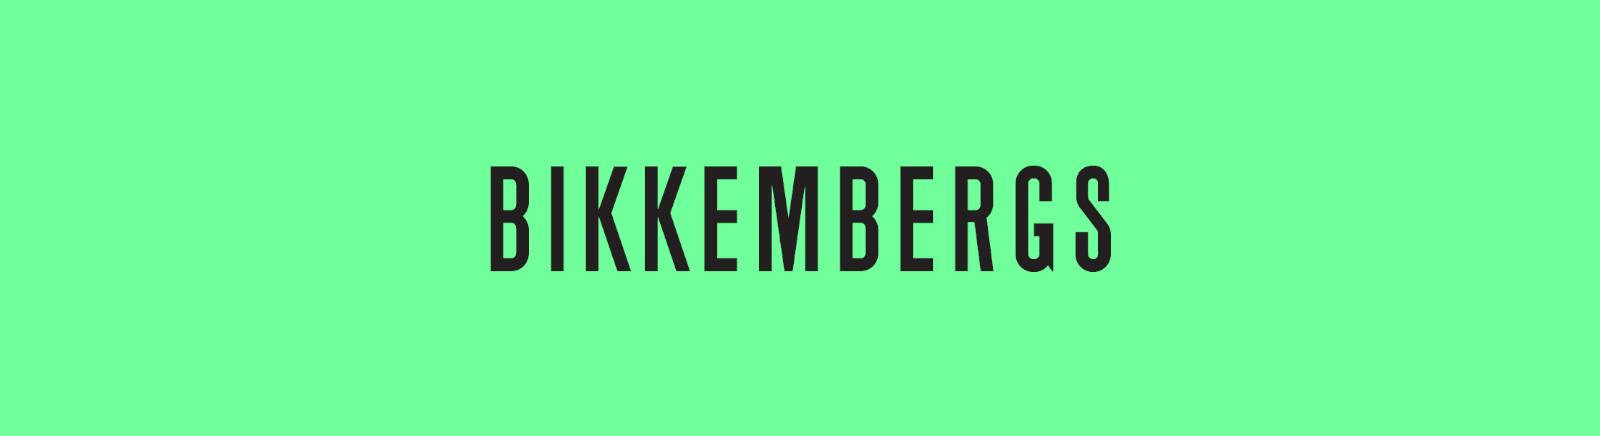 Bikkembergs Herrenschuhe online entdecken im Juppen Shop